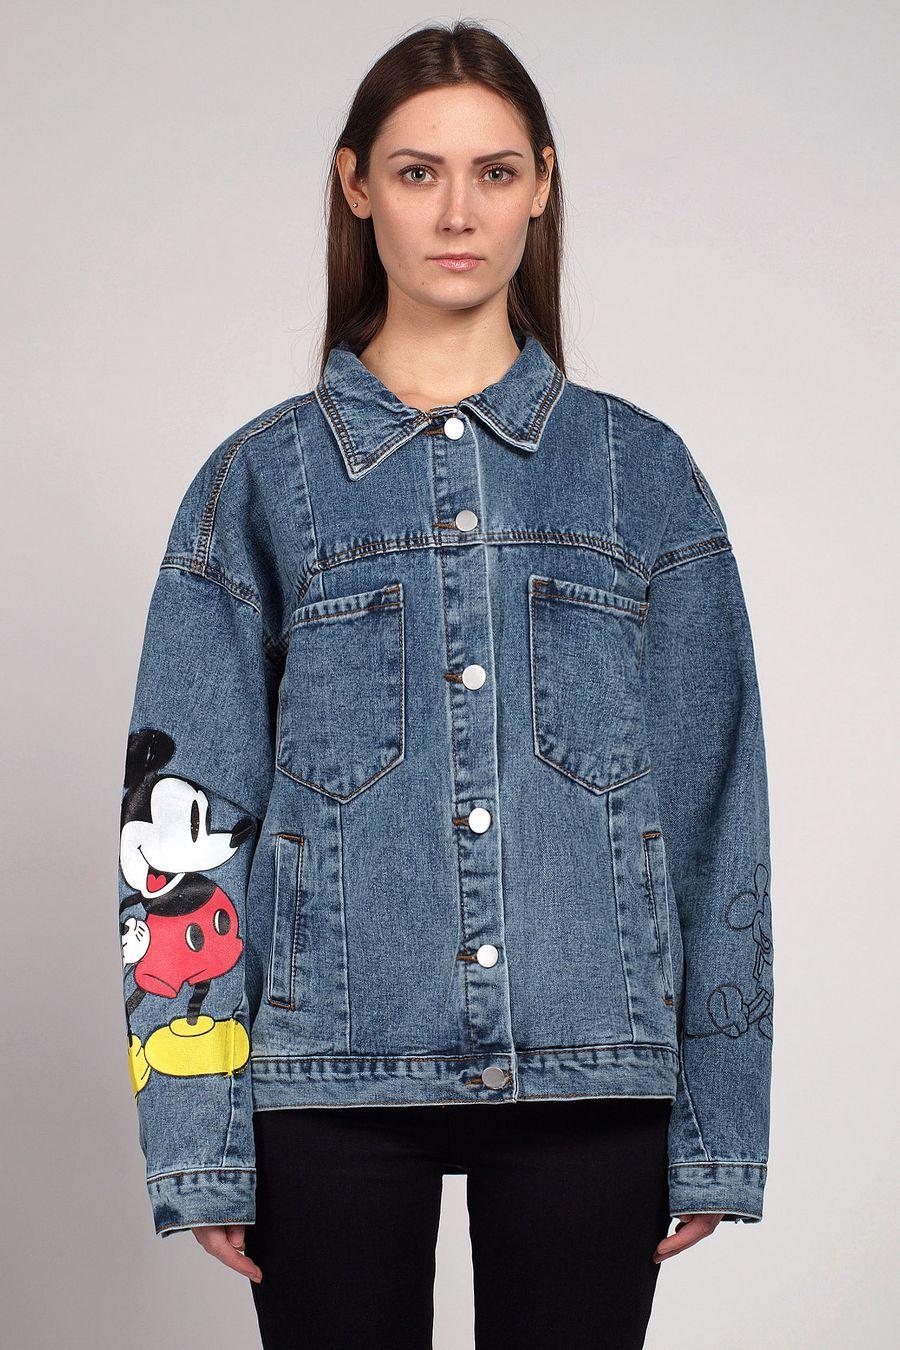 Жакет женский (джинсовка) LRZBS 2006 - фото 1